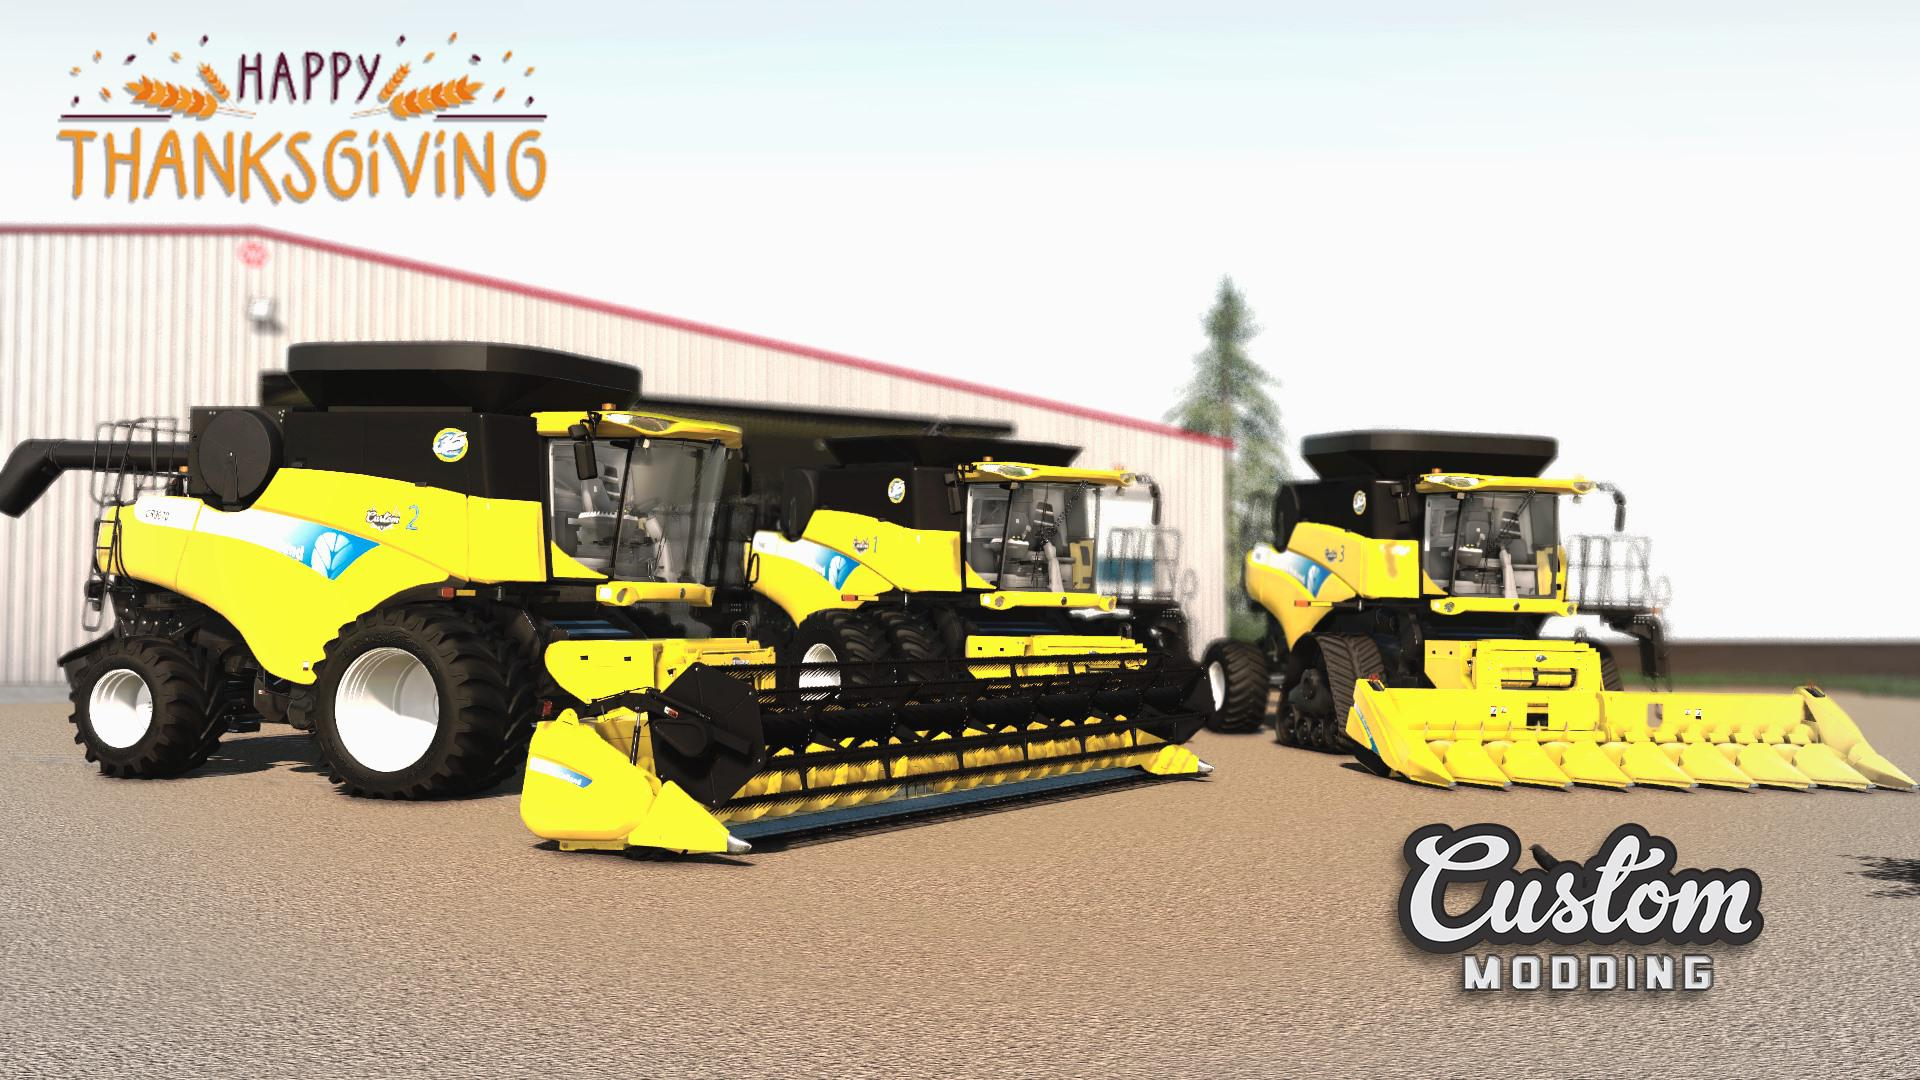 FS19 - New Holland CR9000 Harvester Mod V1.0